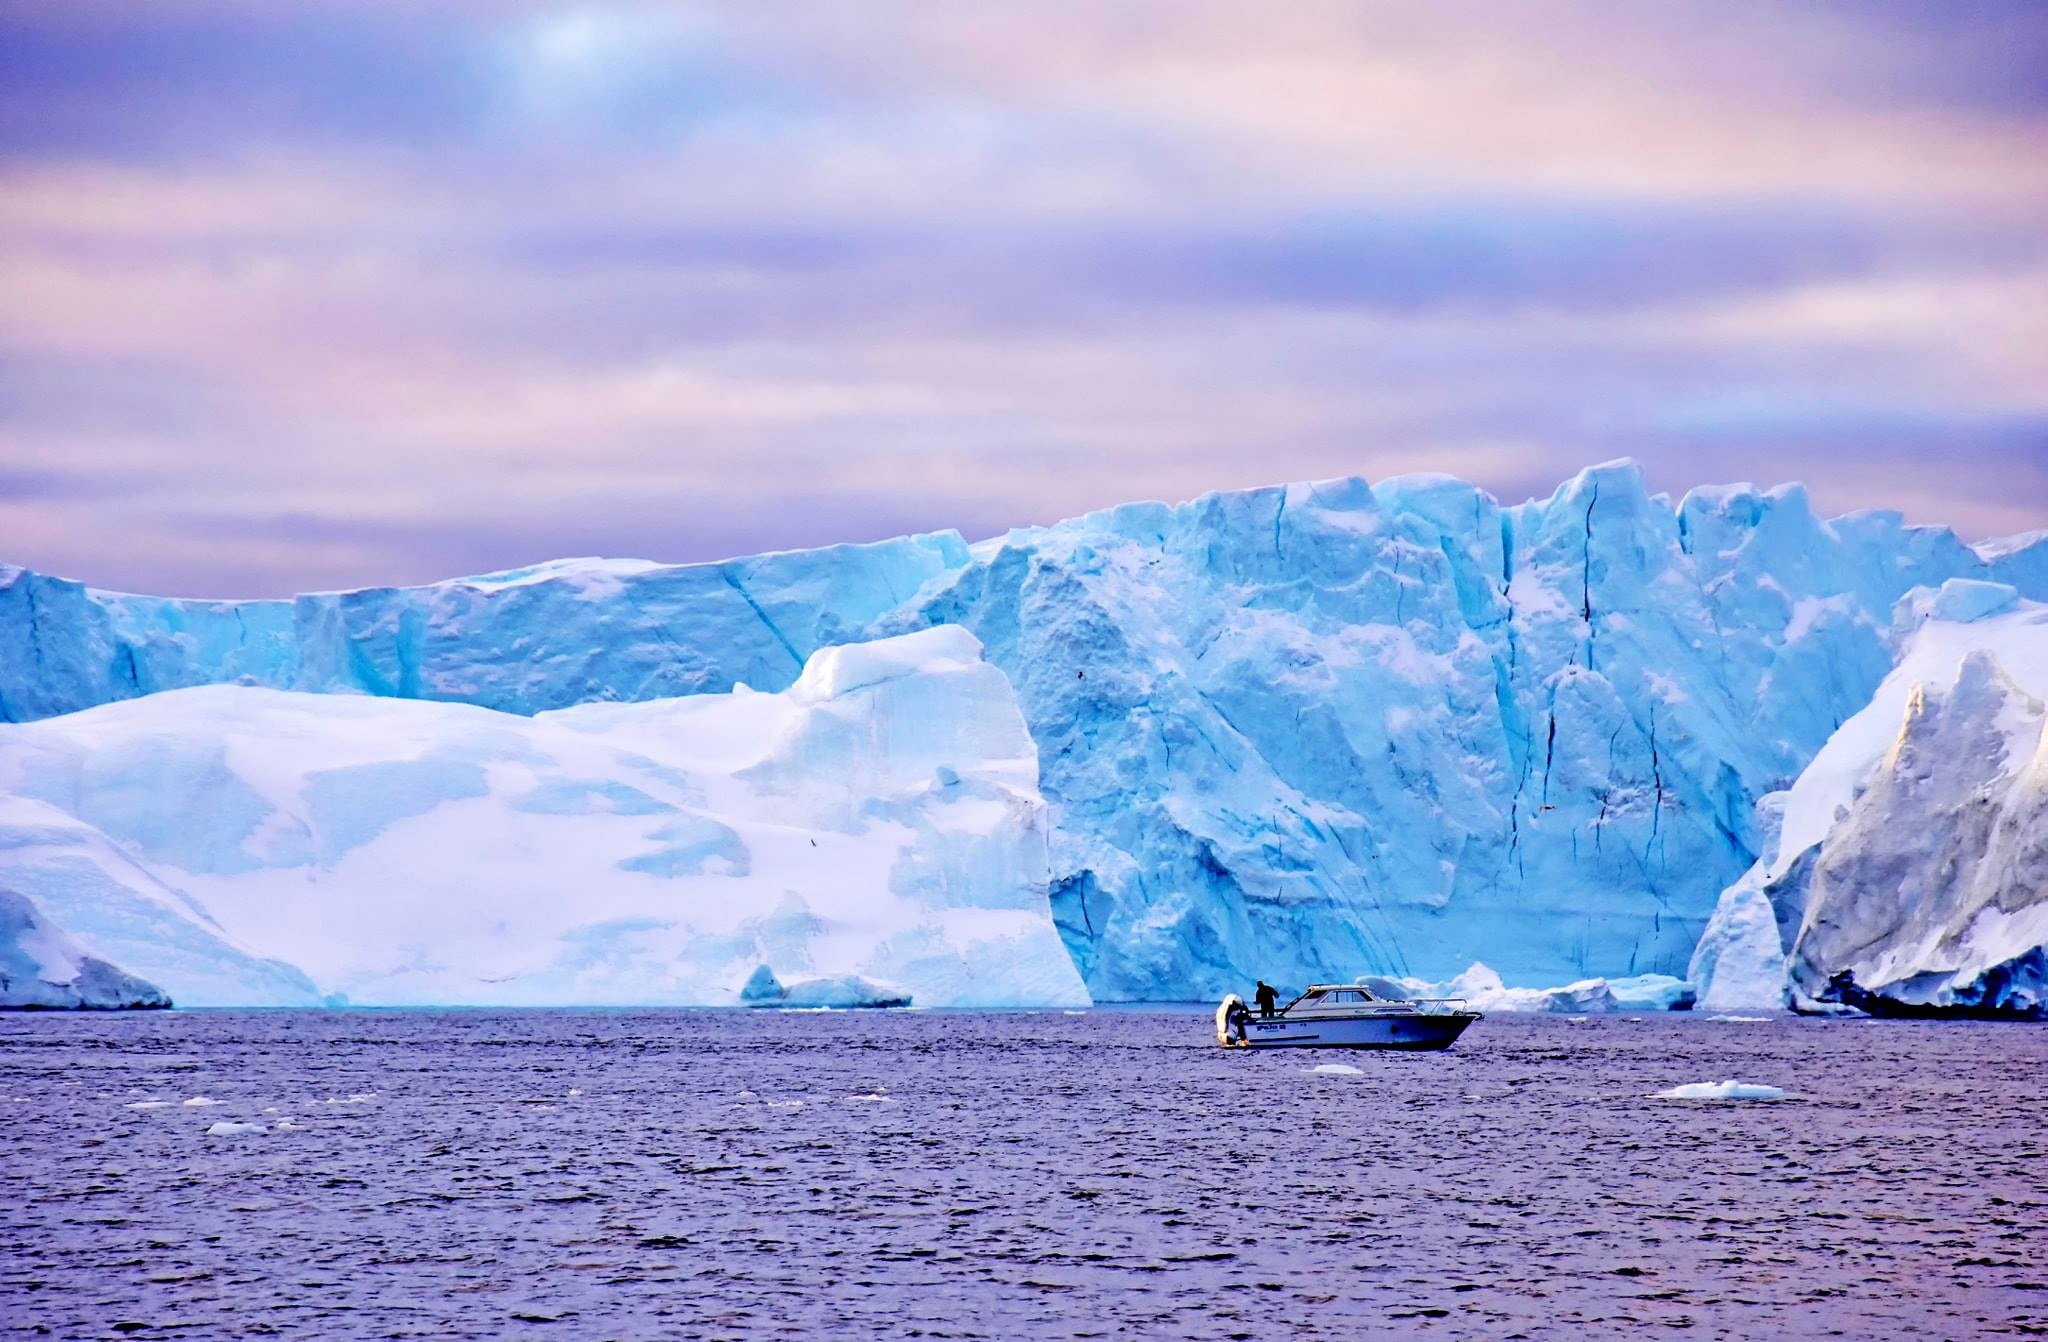 Cau chuyen Greenland va vung dat cuc Bac bi lang quen hinh anh 20